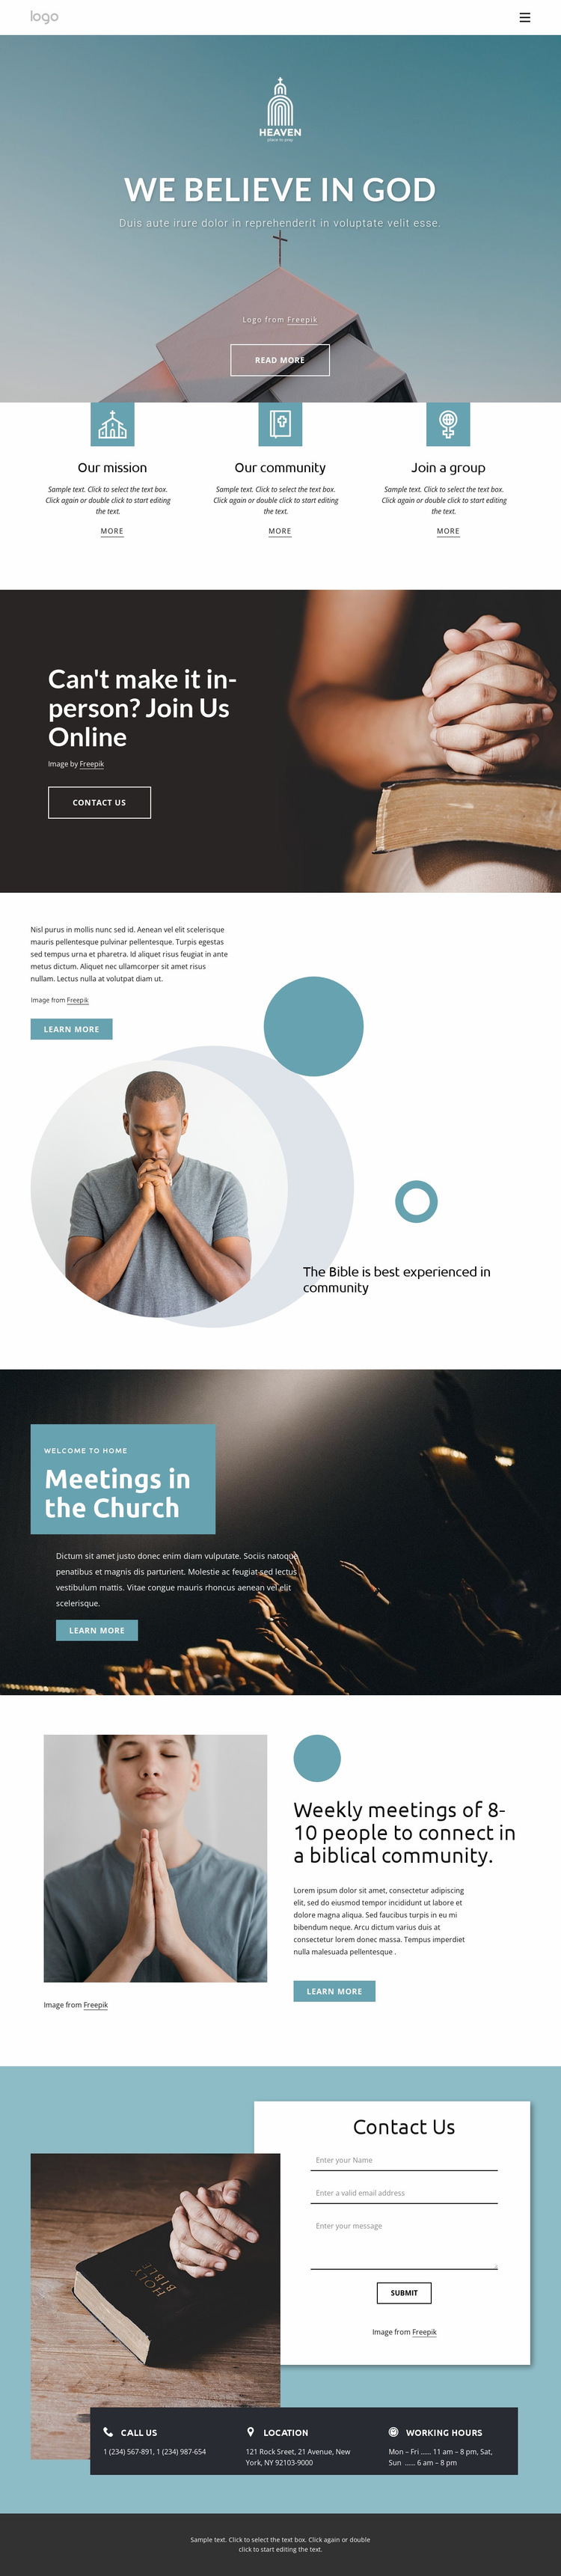 Family friendly church Website Builder Templates